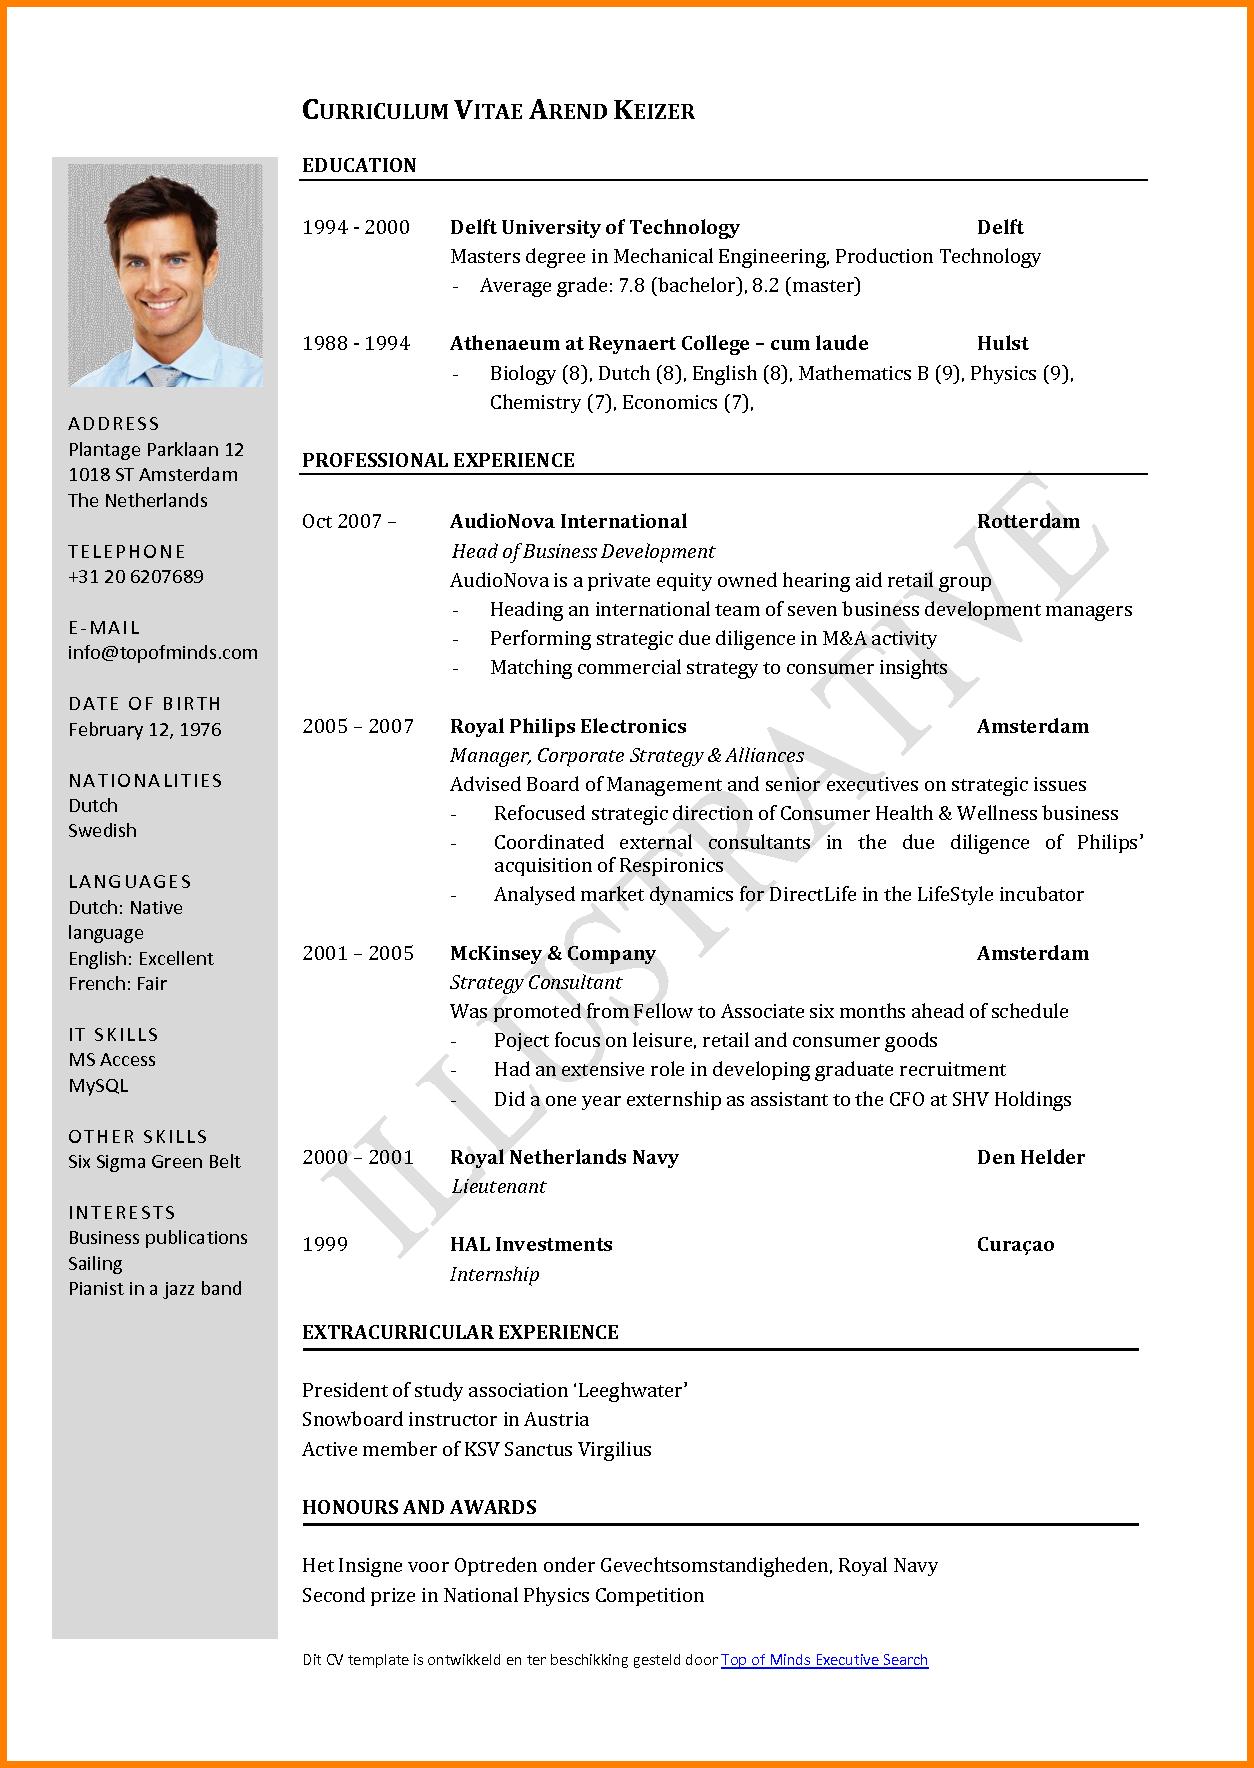 cv en anglais exemple pdf